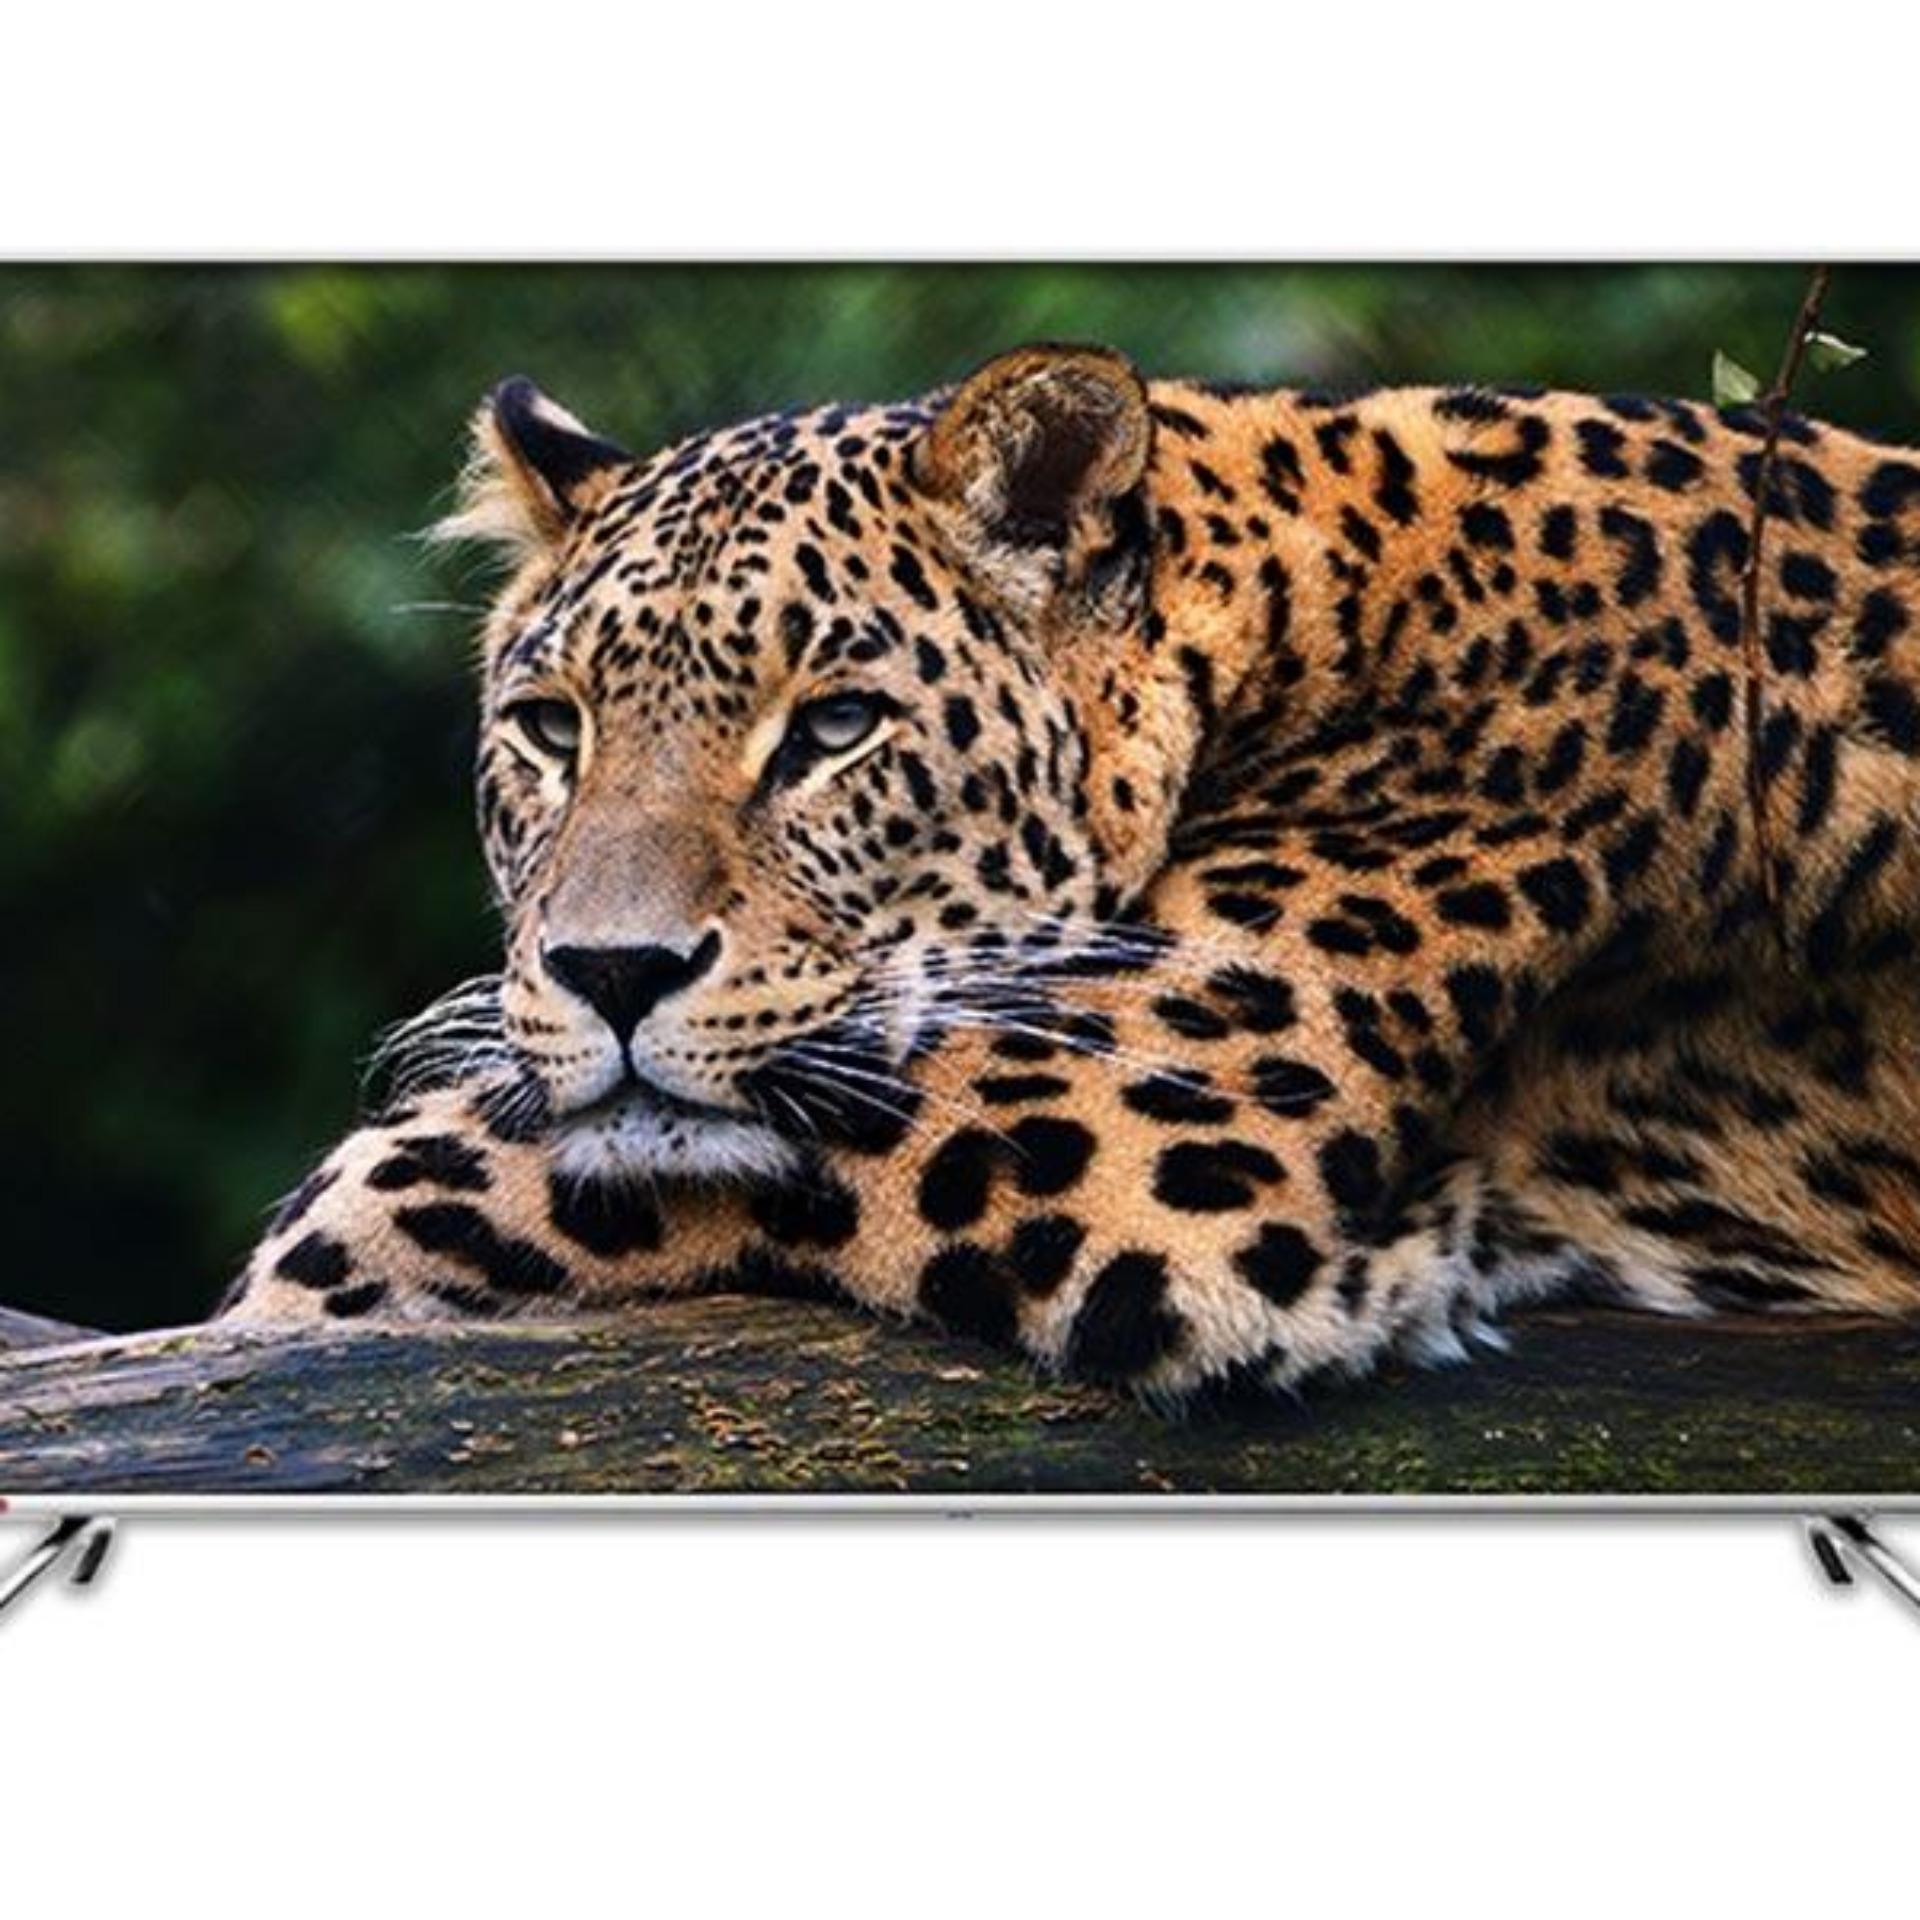 Changhong Framless U65H7A LED TV Android TV [65 Inch/ UHD TV] 4K UHD